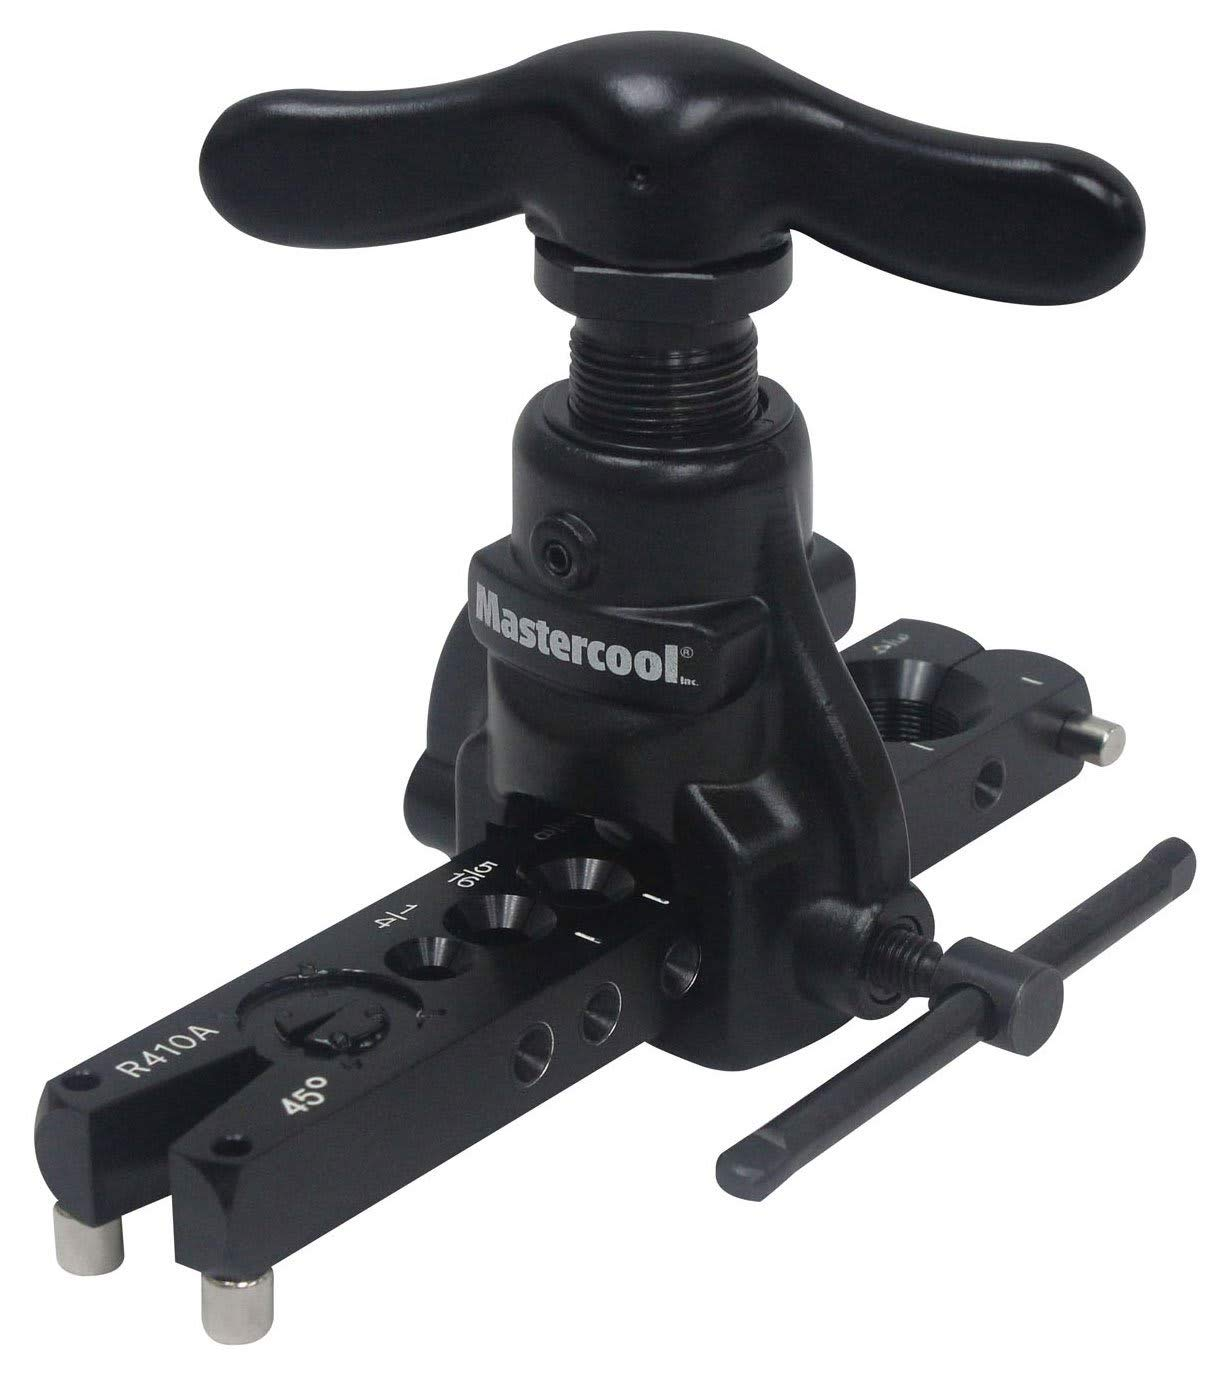 Mastercool (70057-A) Black Eccentric Flaring tool